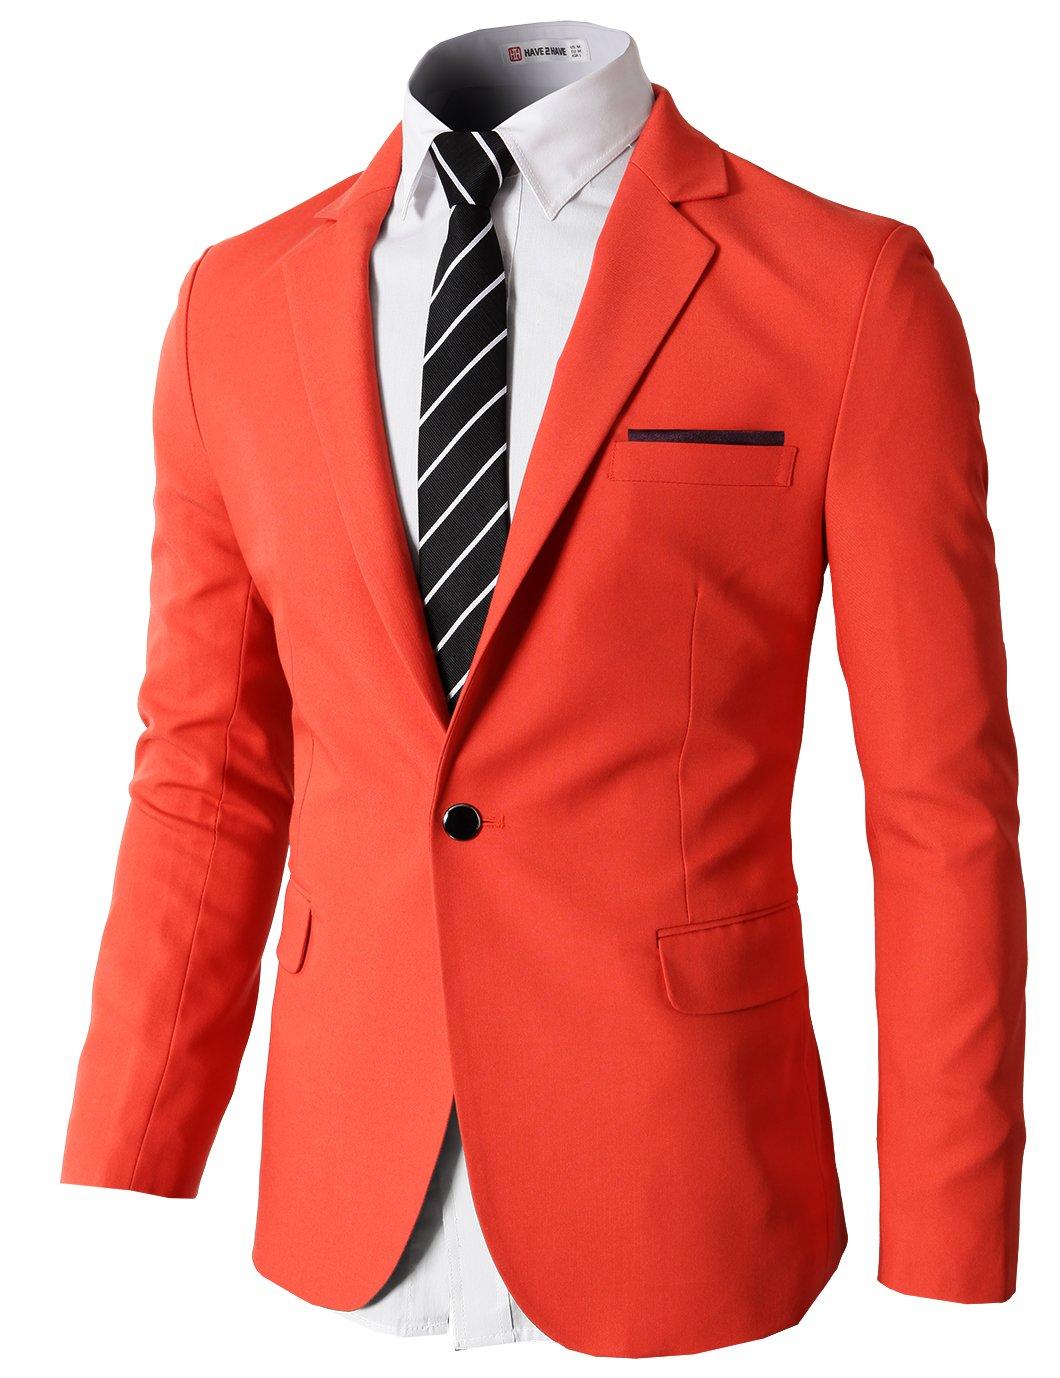 H2H Mens Wearable Designed Single One Button Blazer Jackets with Pocketchief Trim Orange US XL/Asia 2XL (KMOBL046)